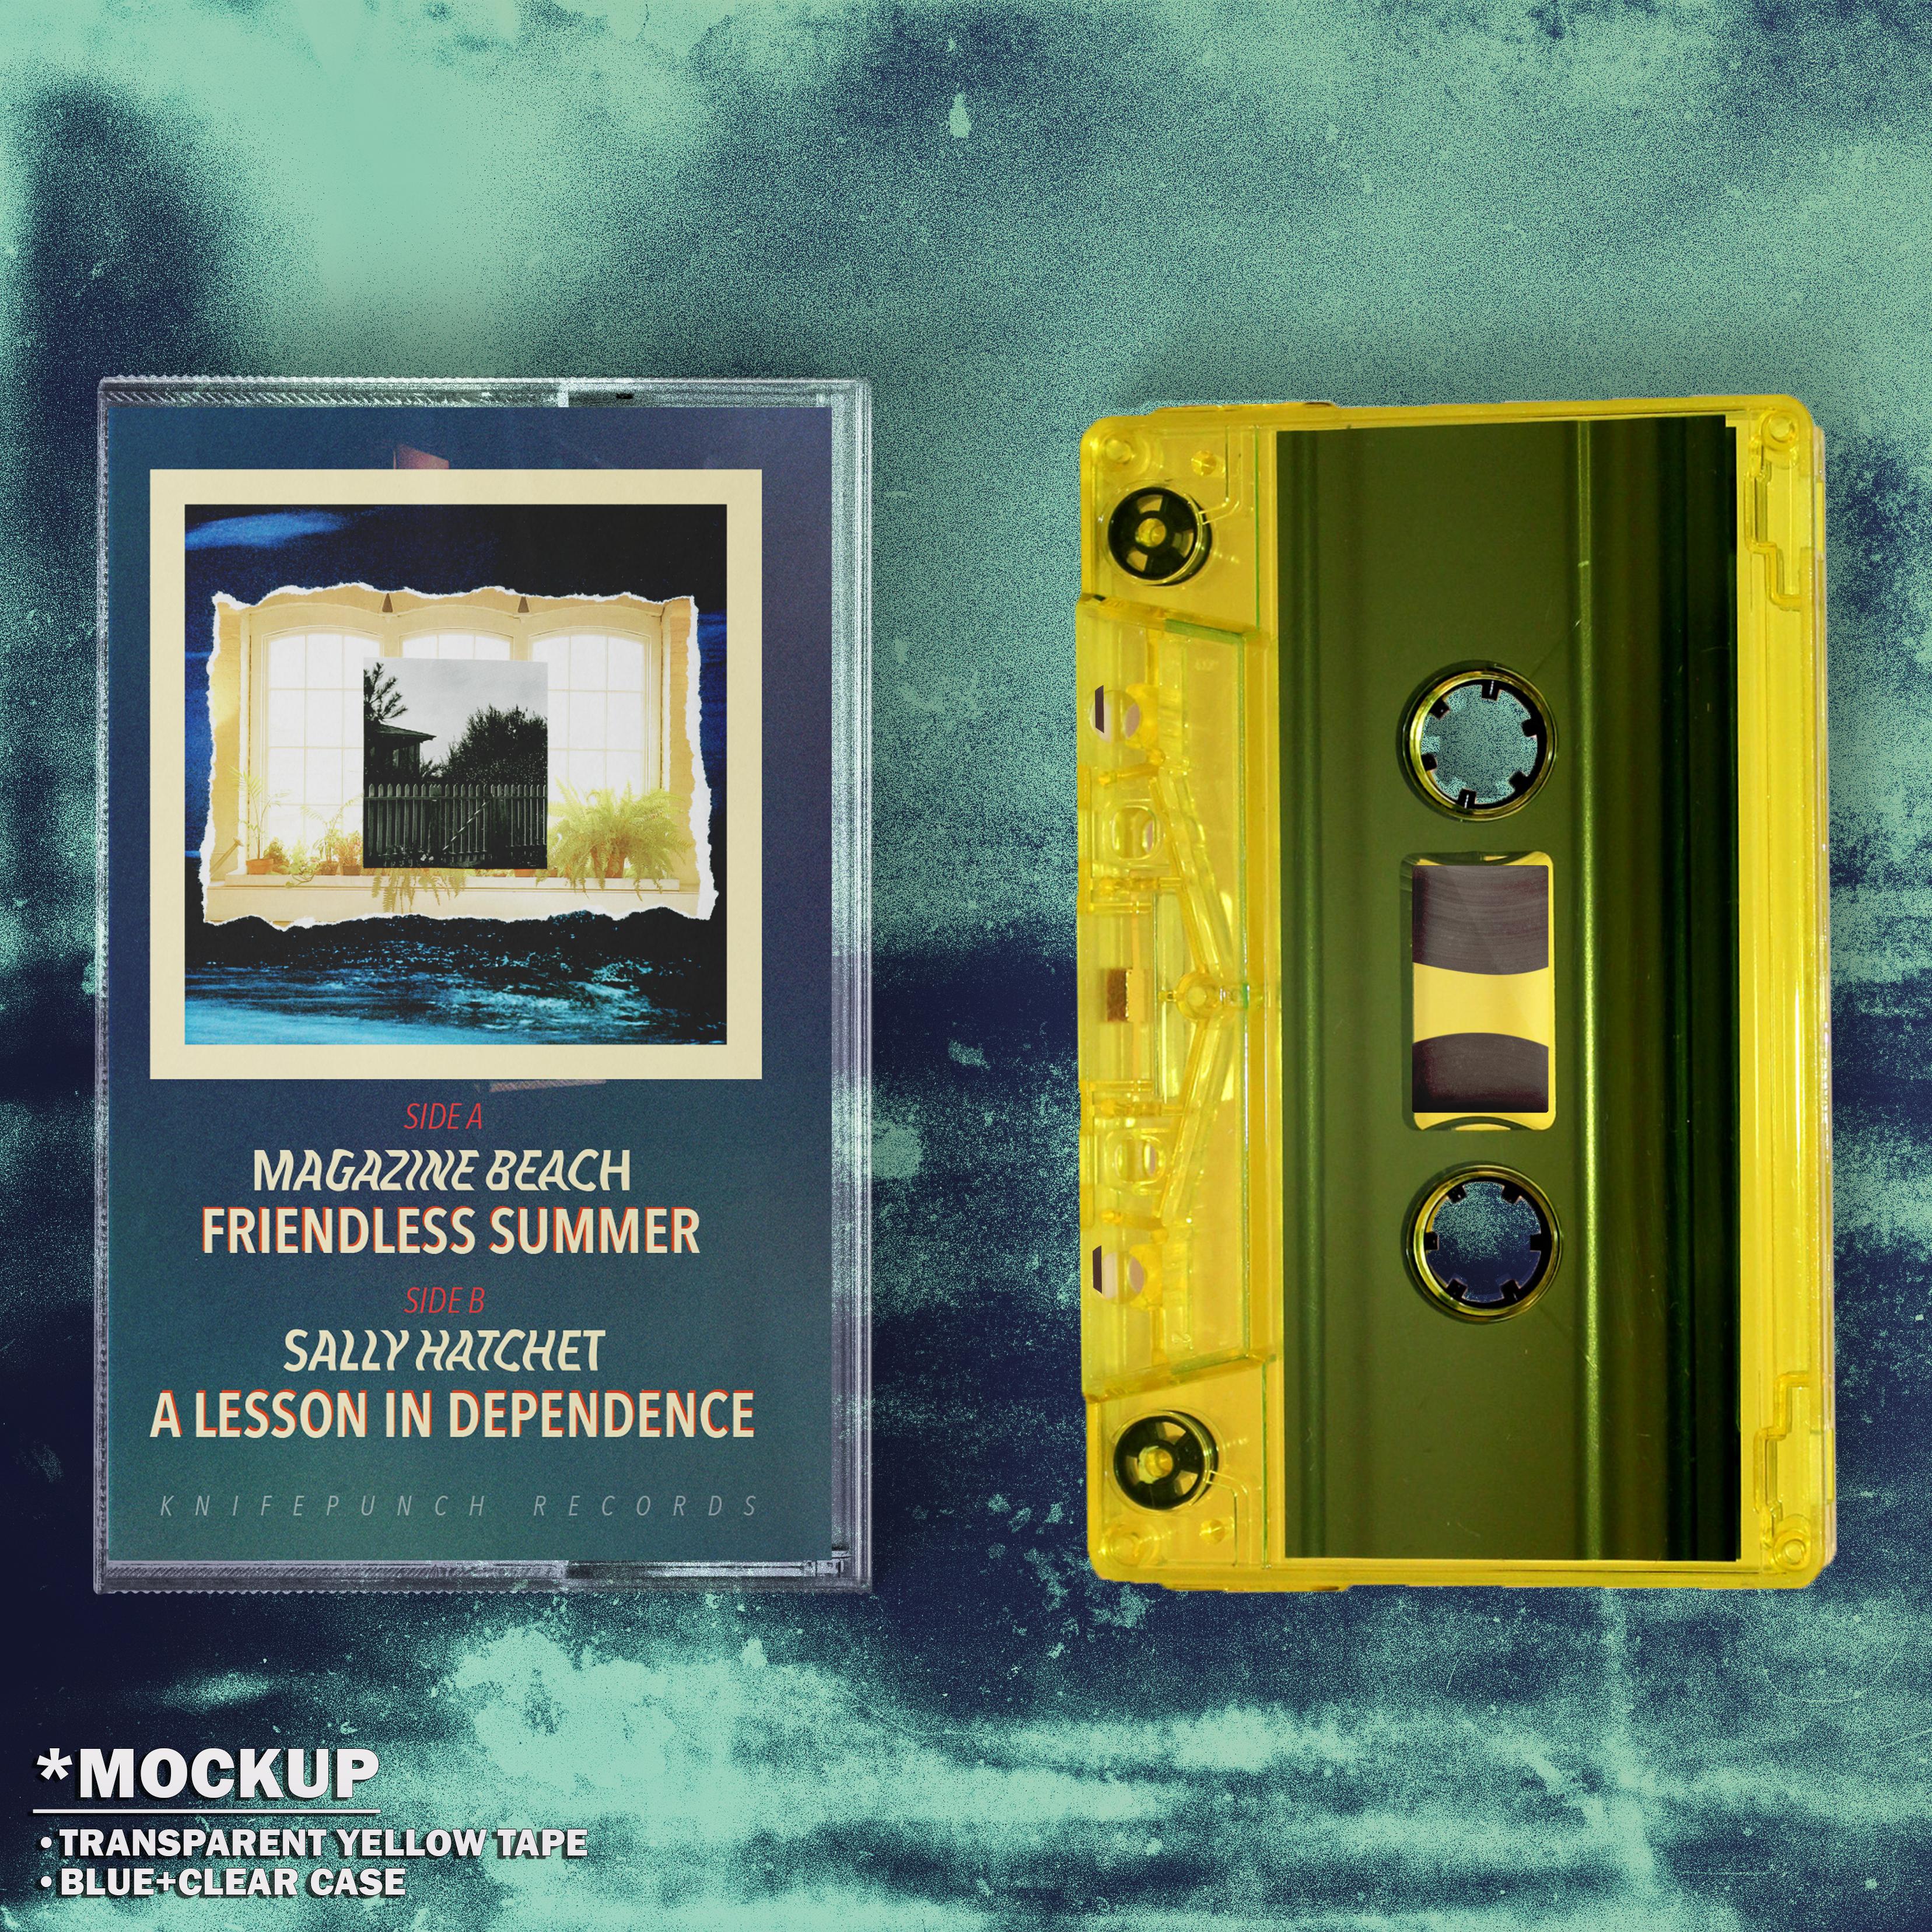 [KPR021] Magazine Beach - Friendless Summer // Sally Hatchet - A Lesson in Dependence || Split EP Tape